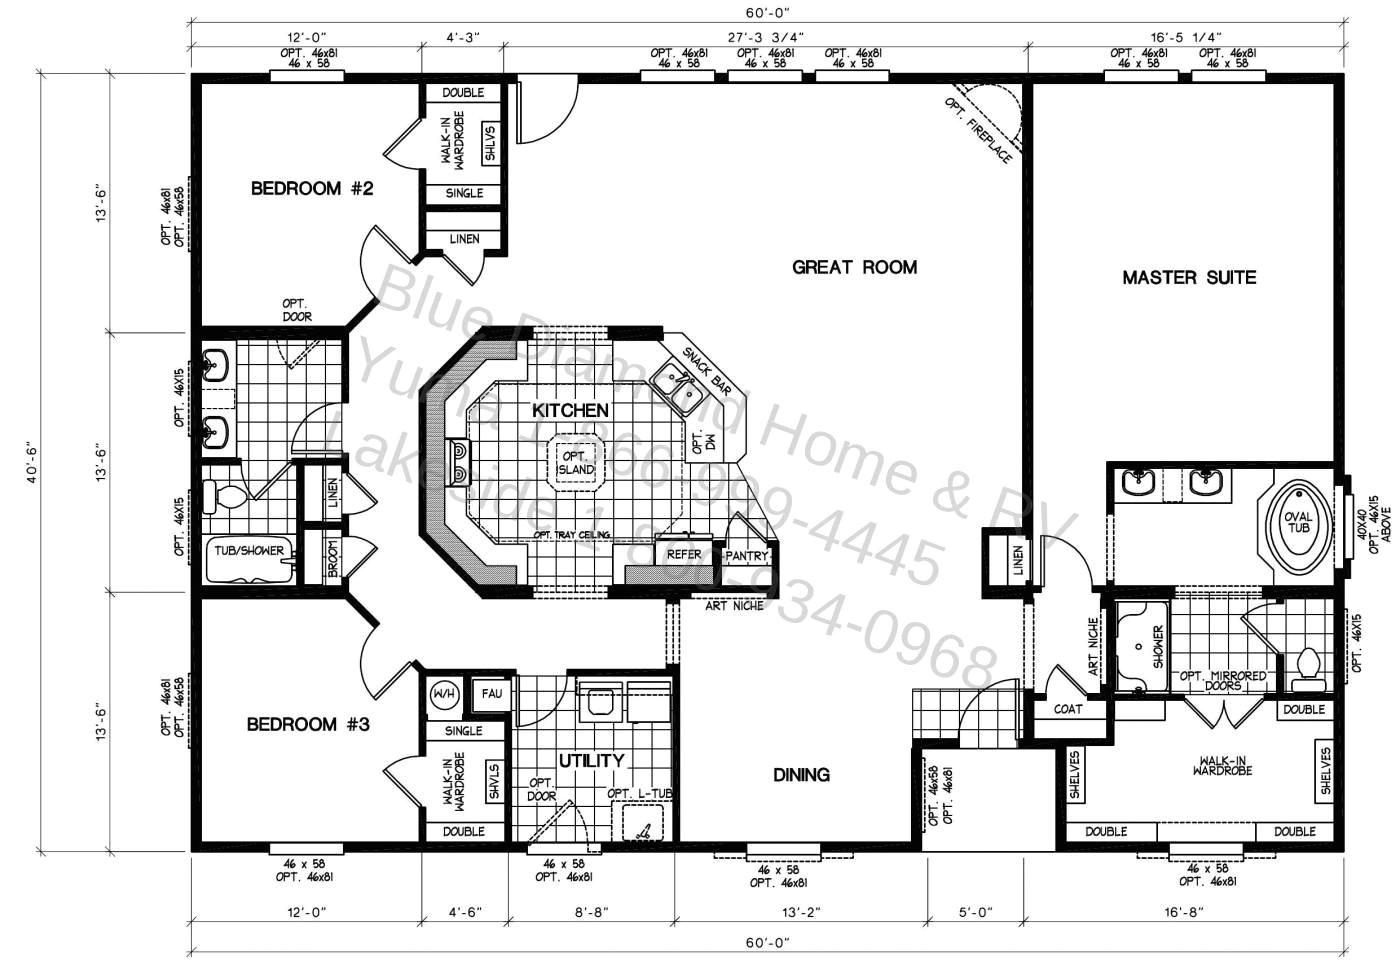 fleetwood mobile home floor plans unique manufactured homes marlette floor plans home triple wide 6 bedroom